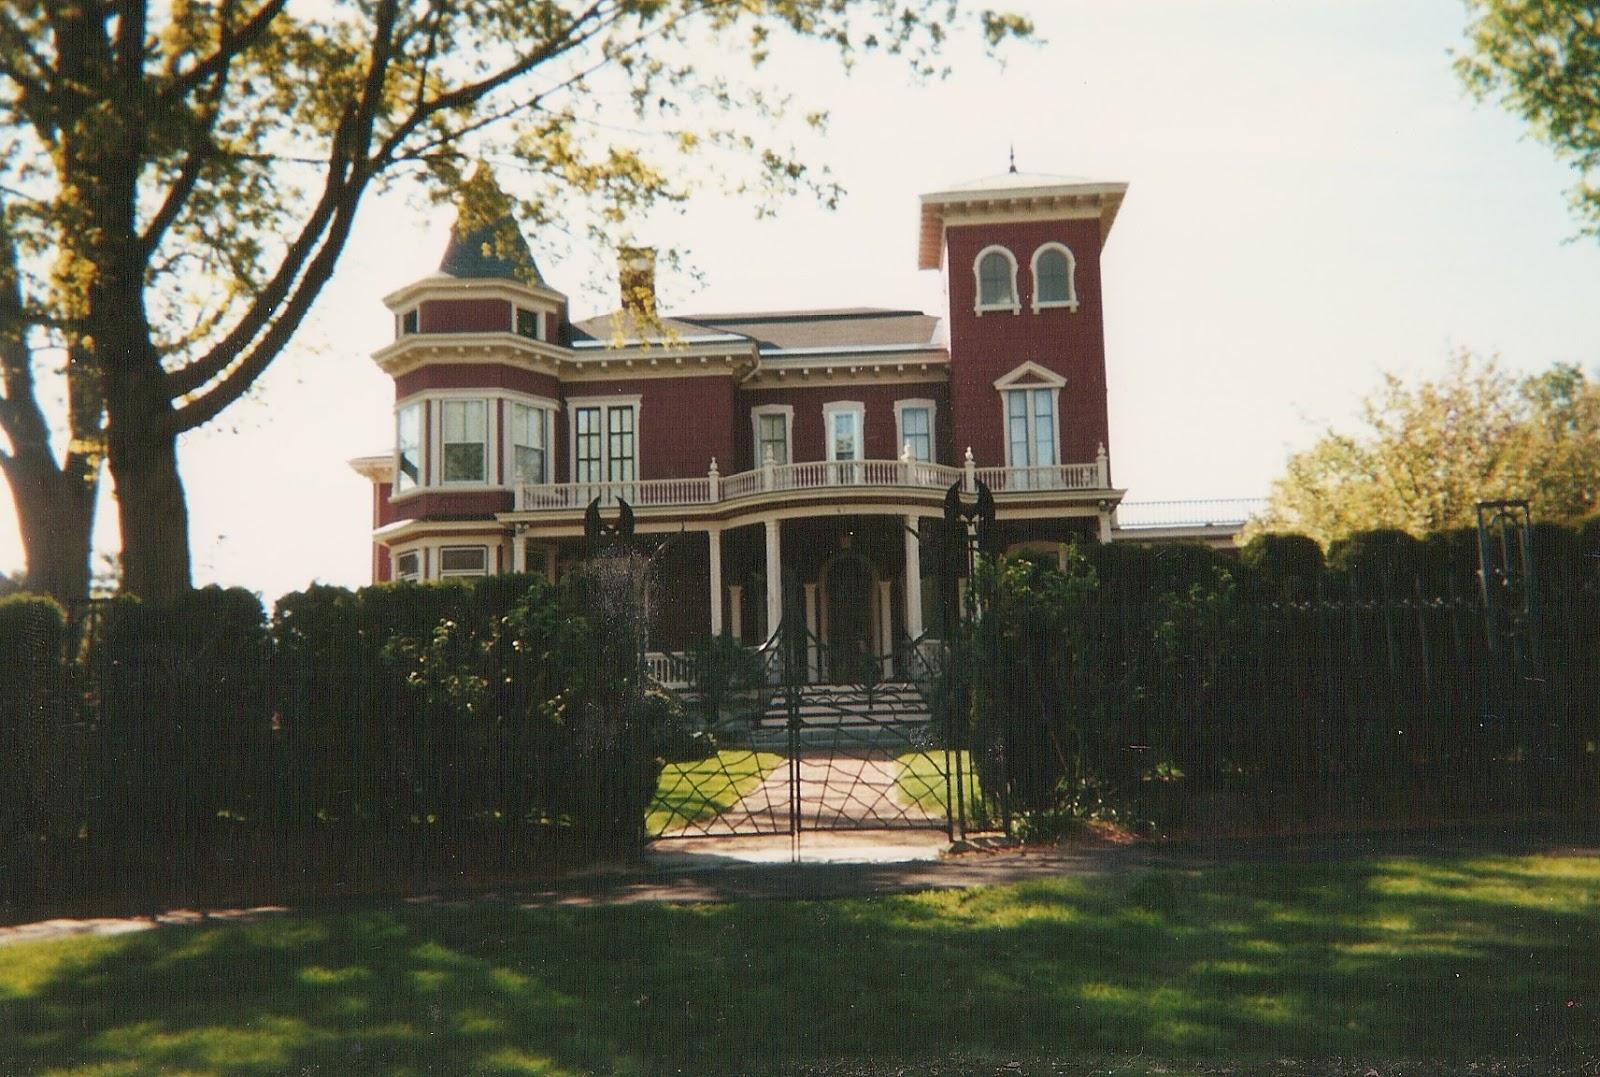 My Literary Travels: Stephen King's House, Bangor, ME (2009)